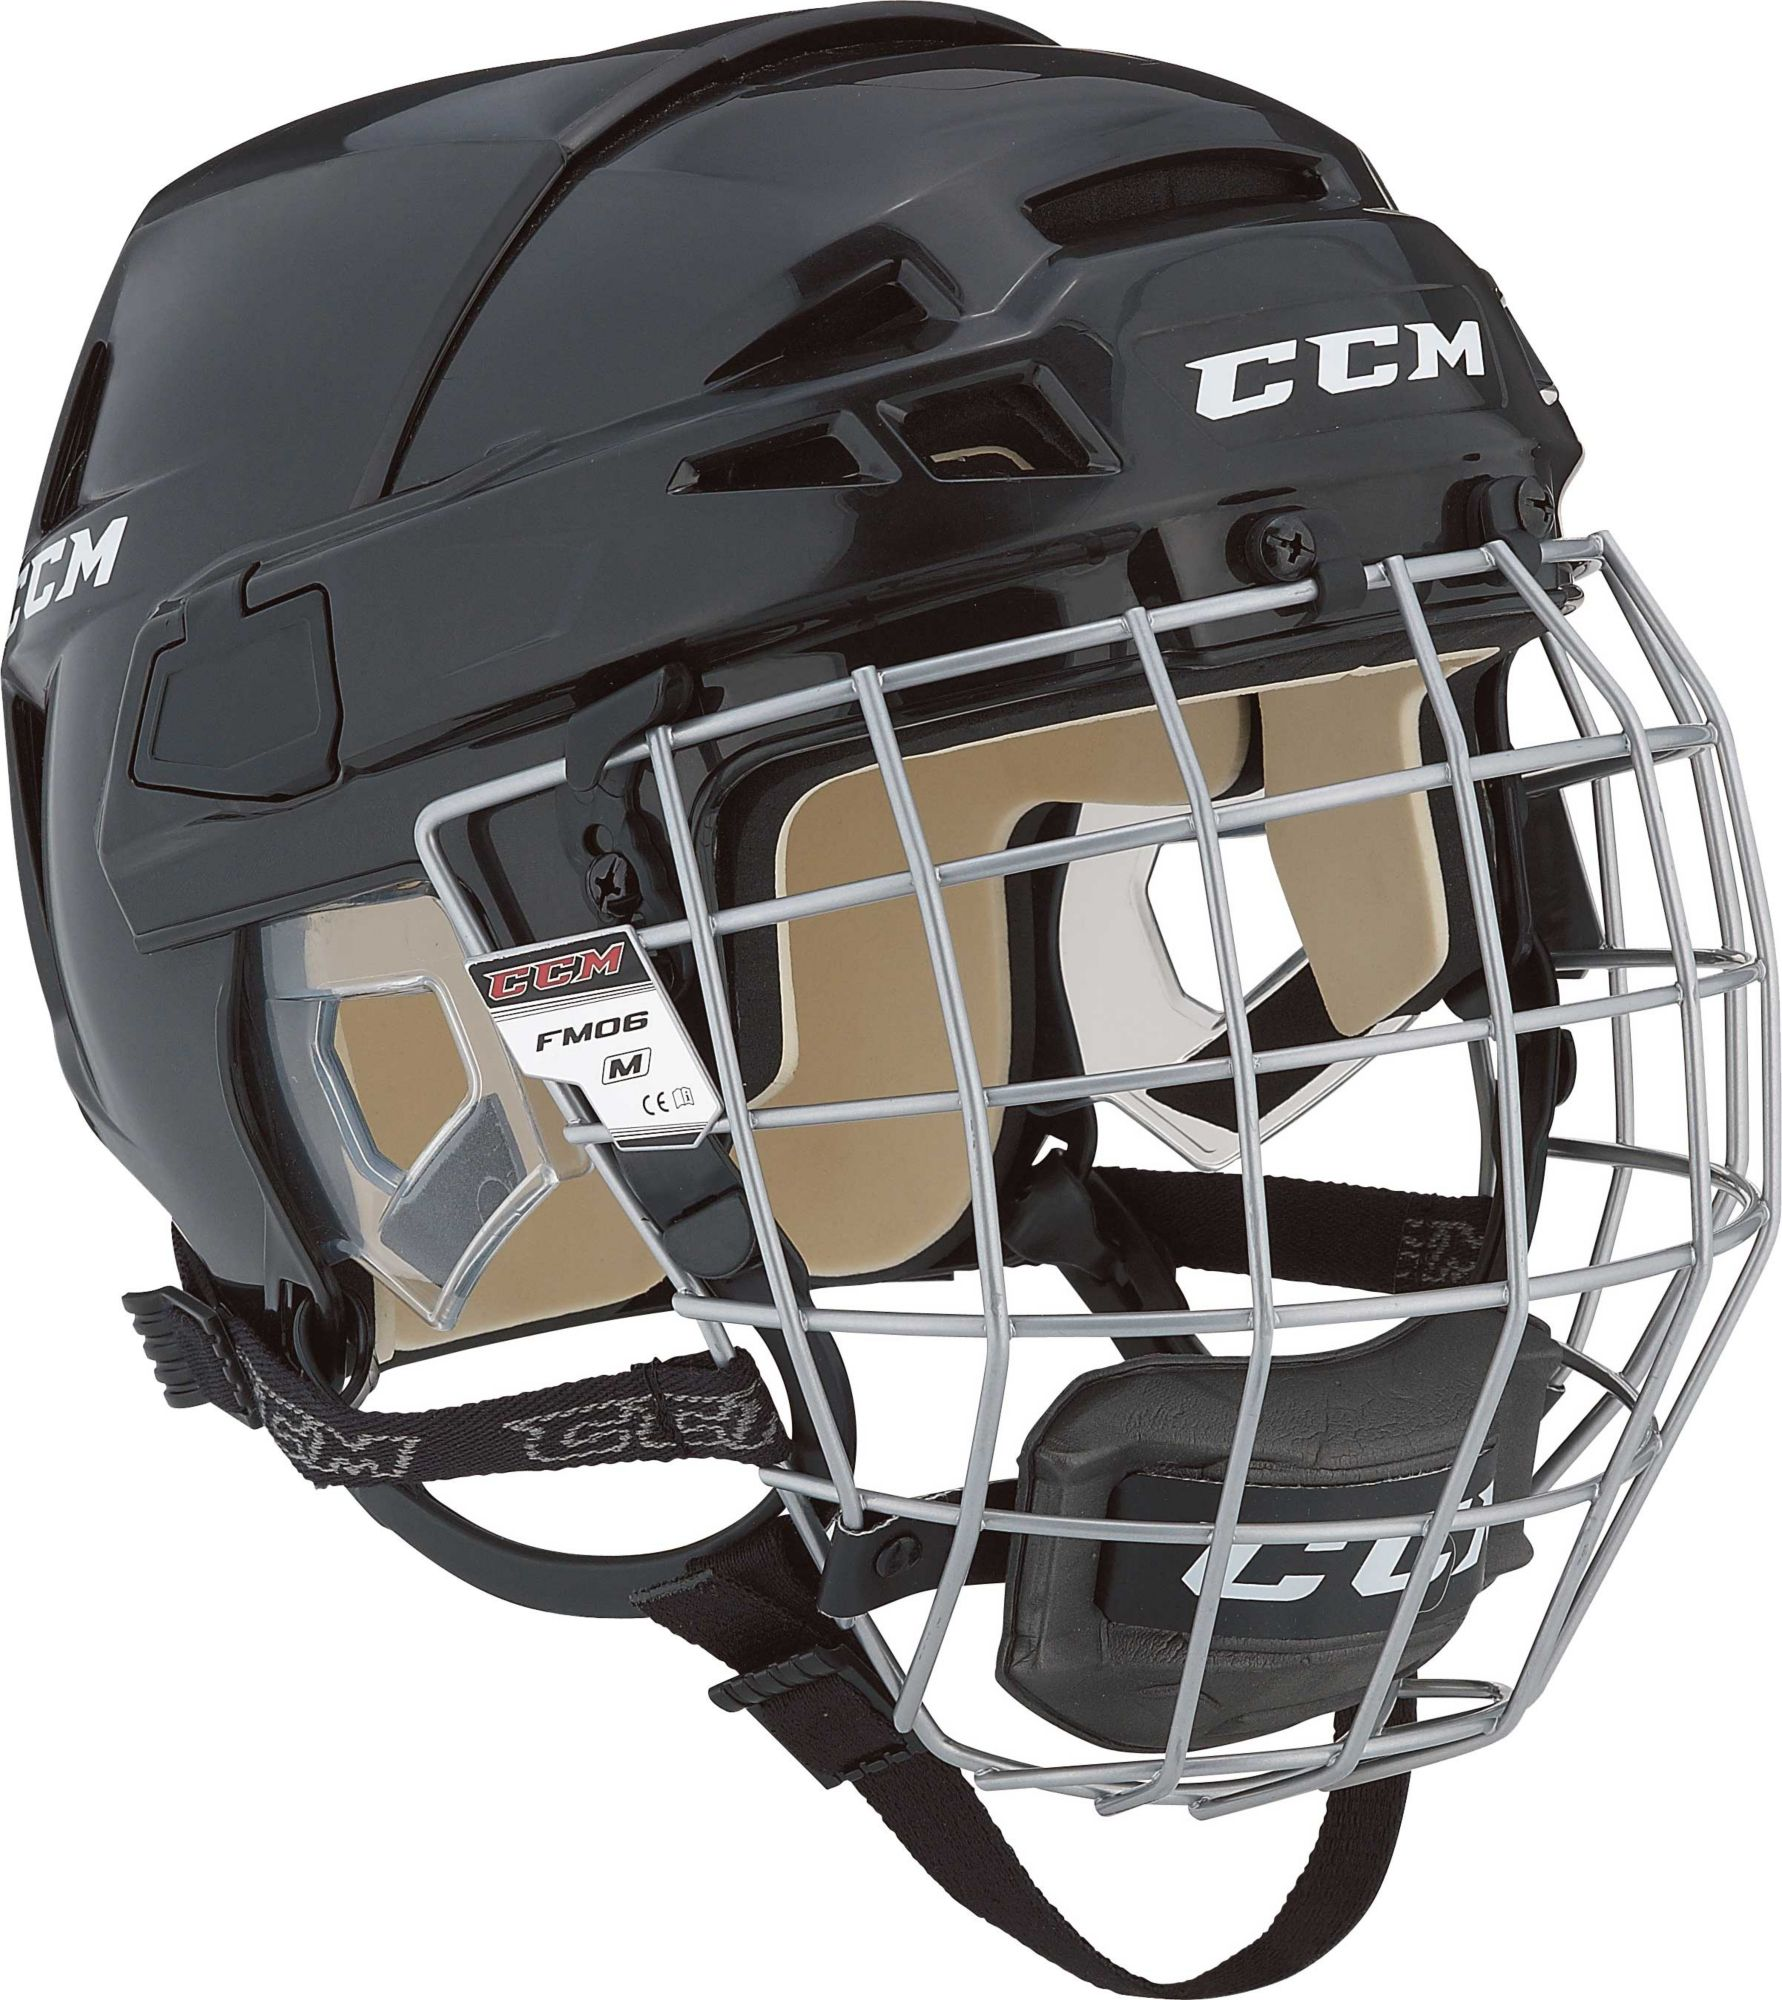 CCM Vector 08 Ice Hockey Helmet Combo | DICK'S Sporting Goods